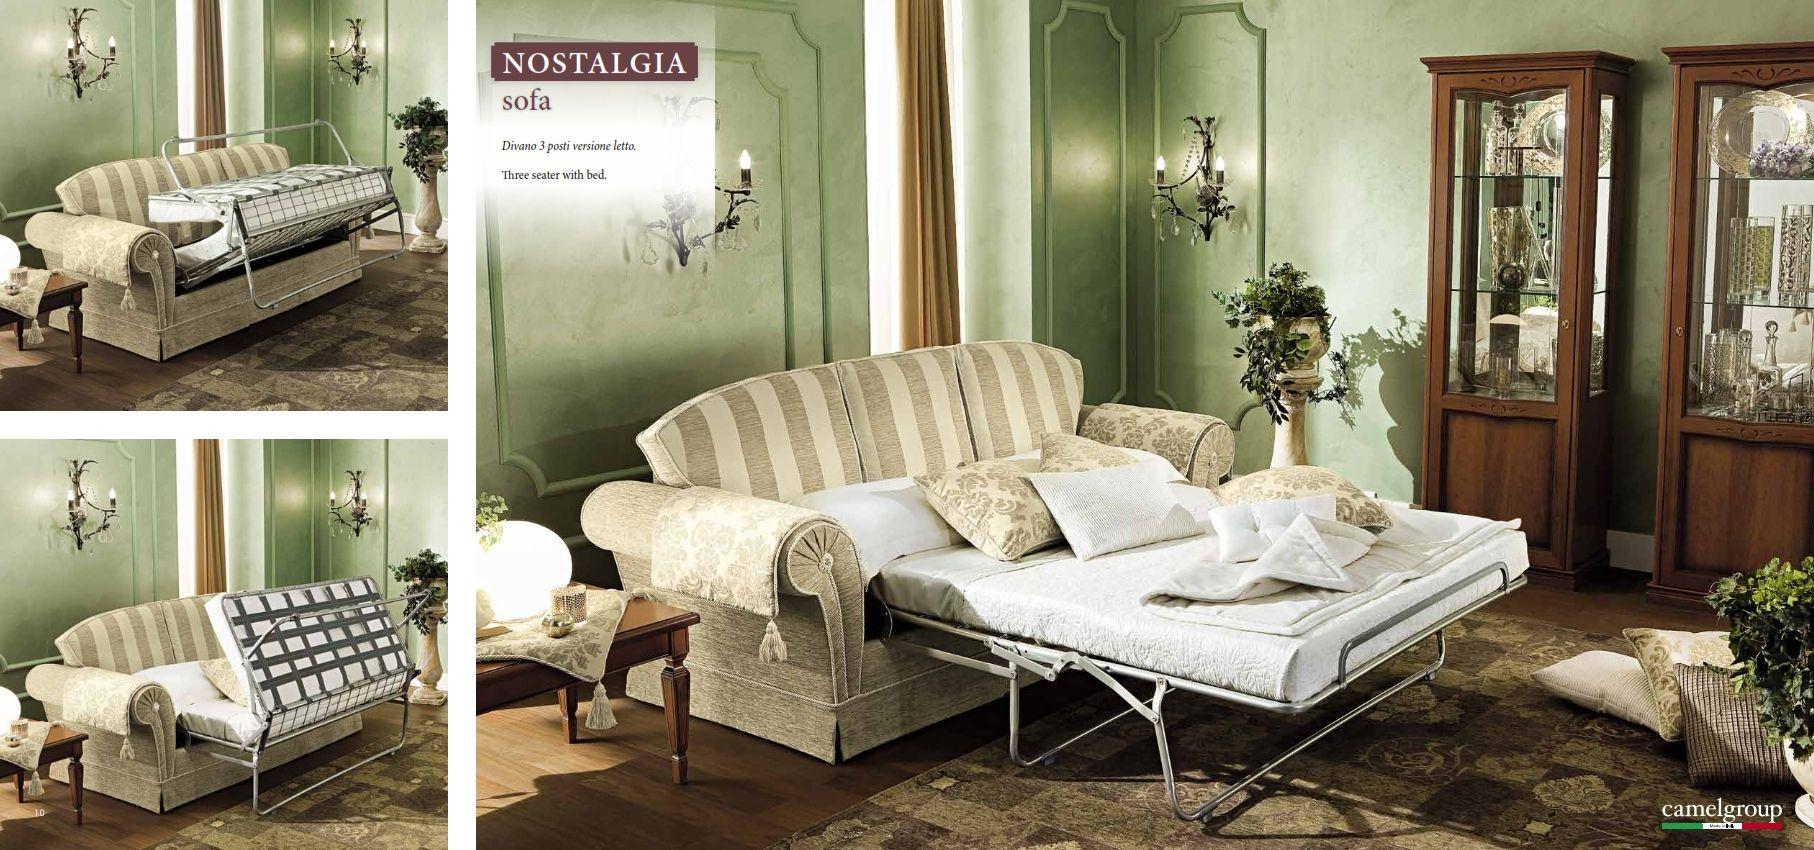 klassische m bel sofas camelgroup sofa nostalgie seriedie m bel aus italien. Black Bedroom Furniture Sets. Home Design Ideas